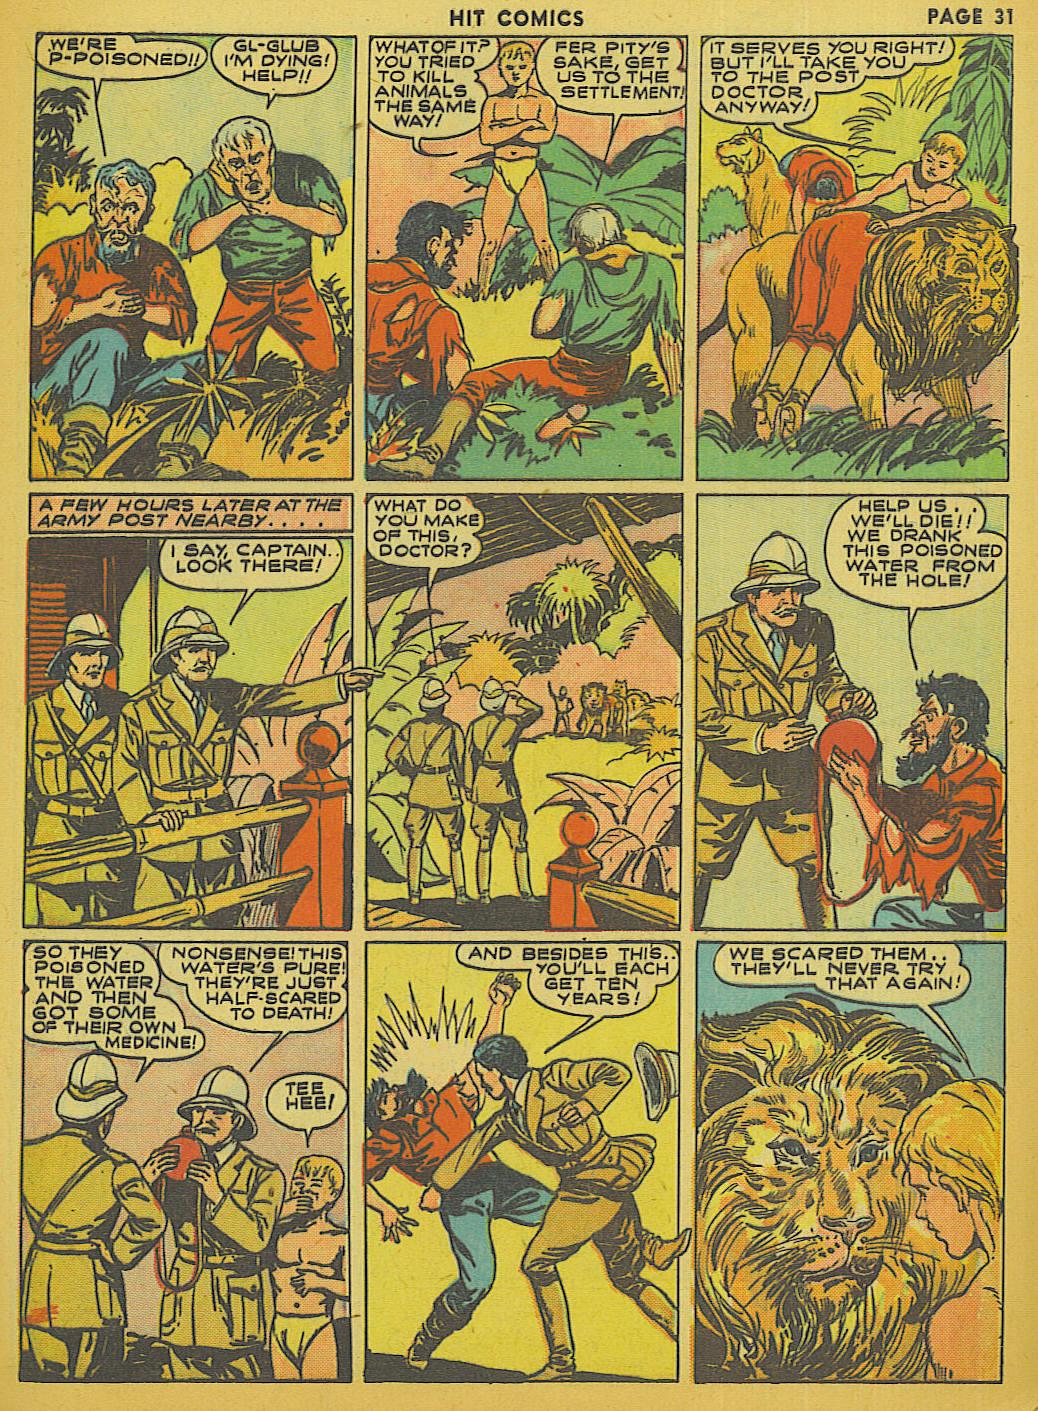 Read online Hit Comics comic -  Issue #13 - 33